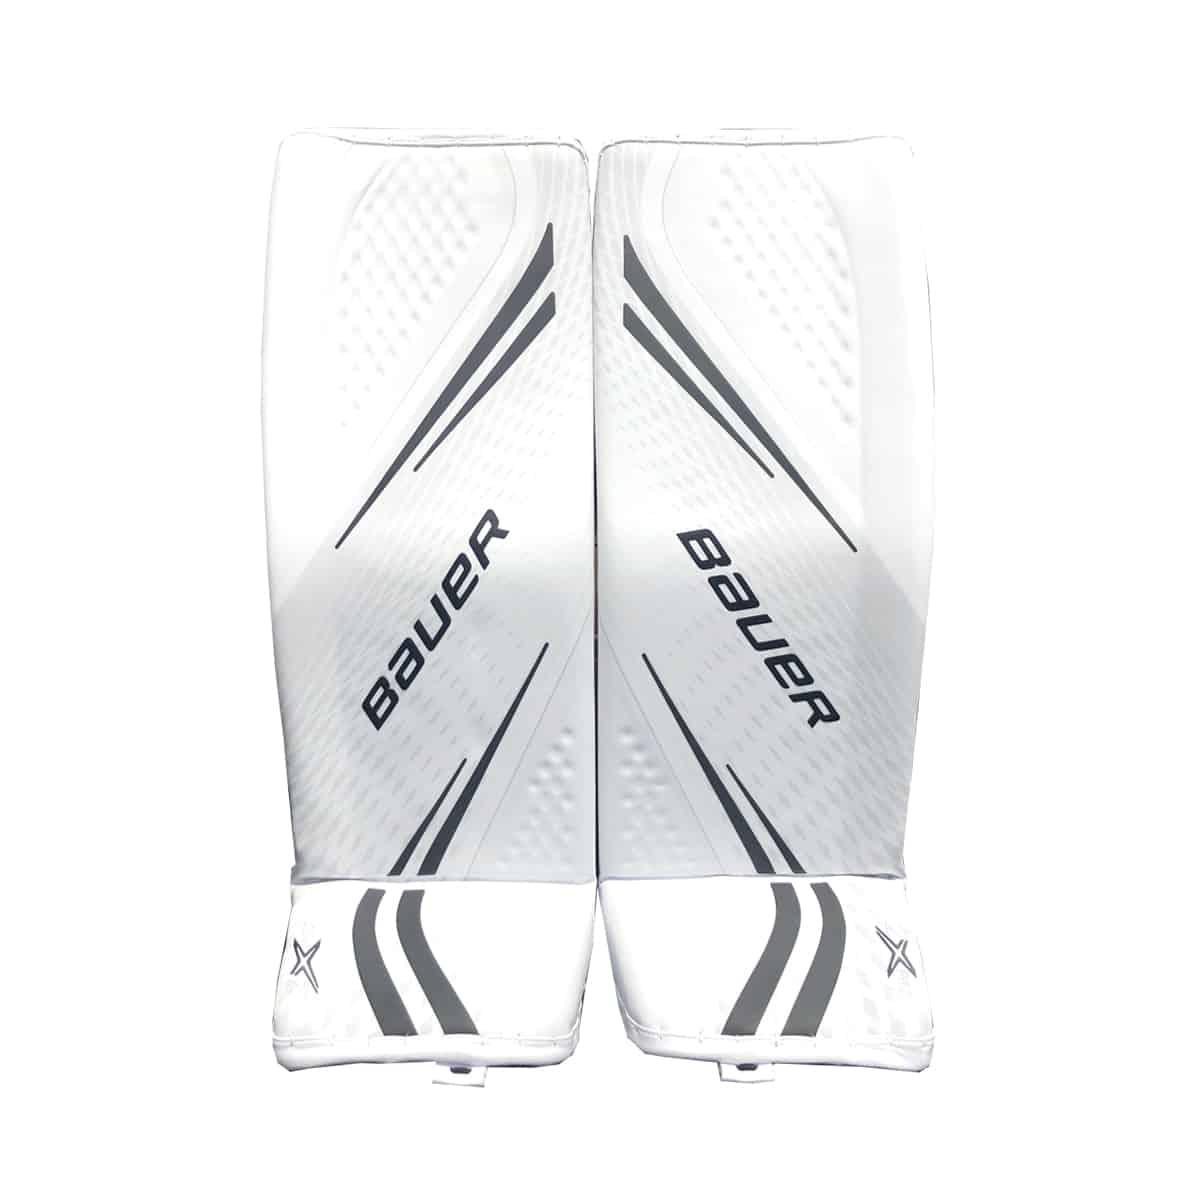 Bauer Vapor 2X Pro Senior Goalie Leg Pads